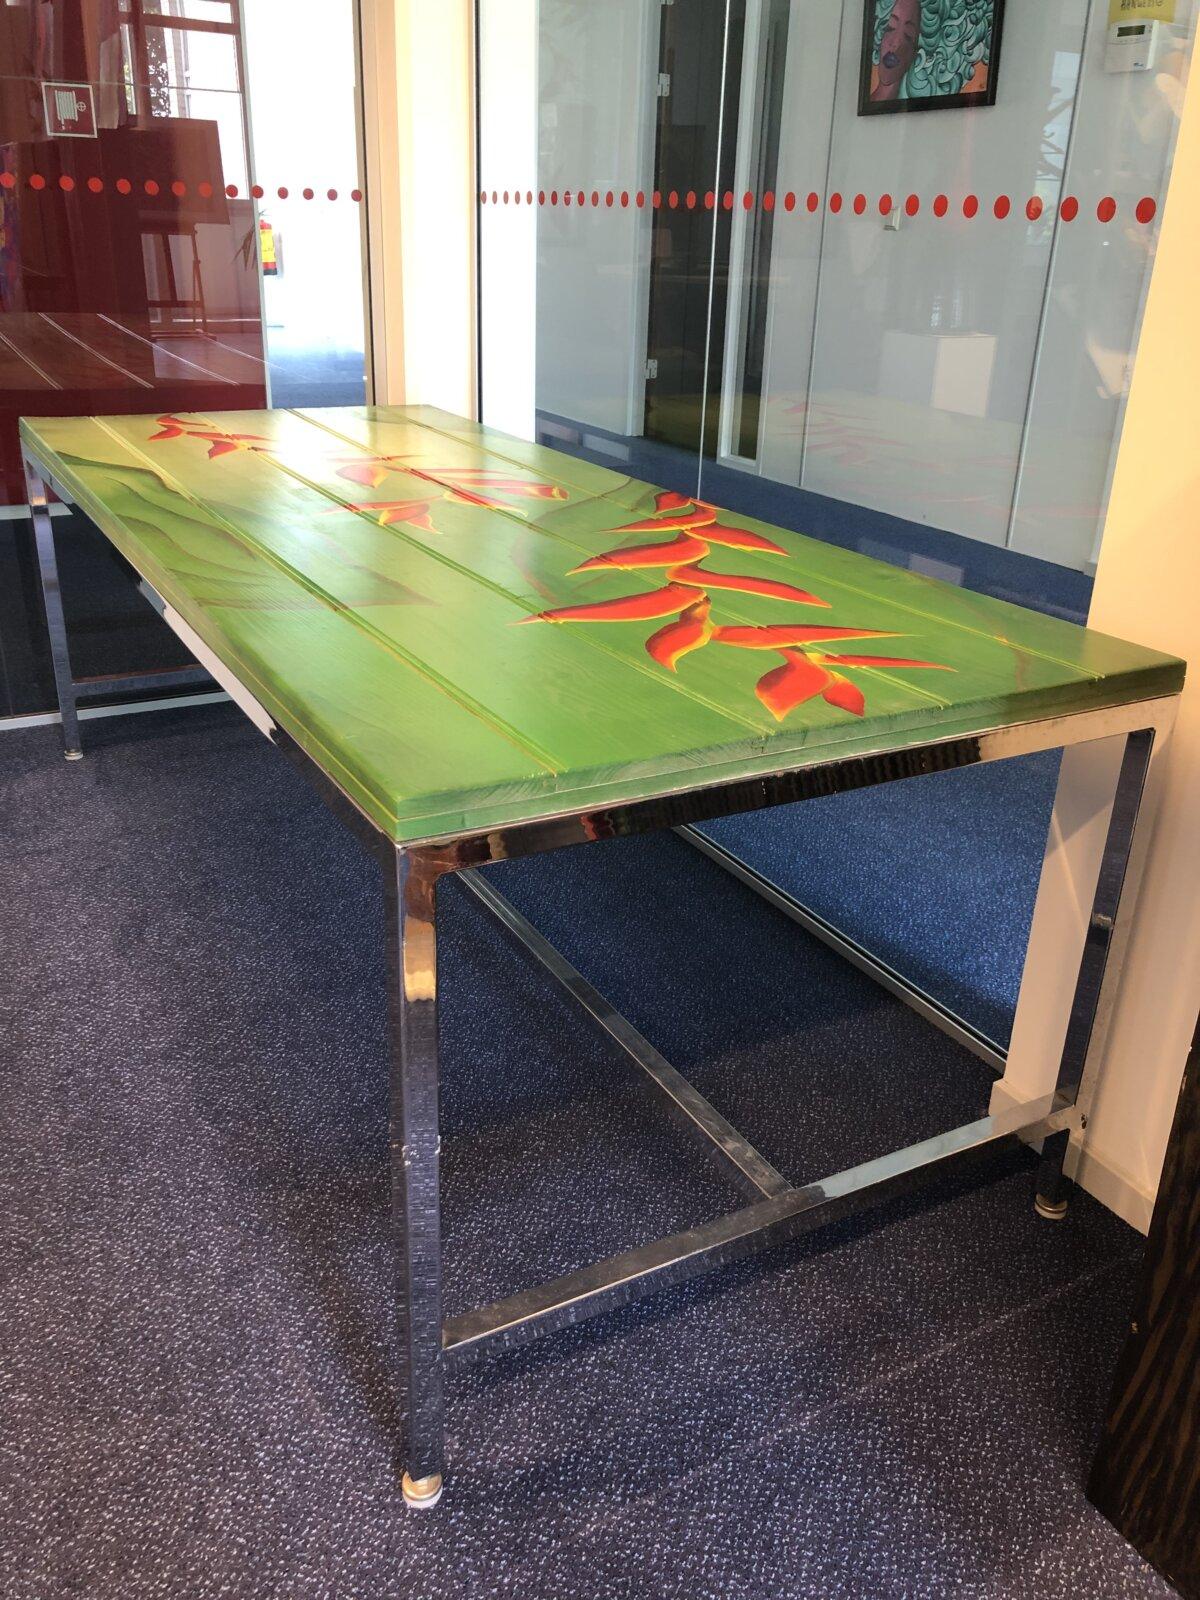 Paloeloe tafel